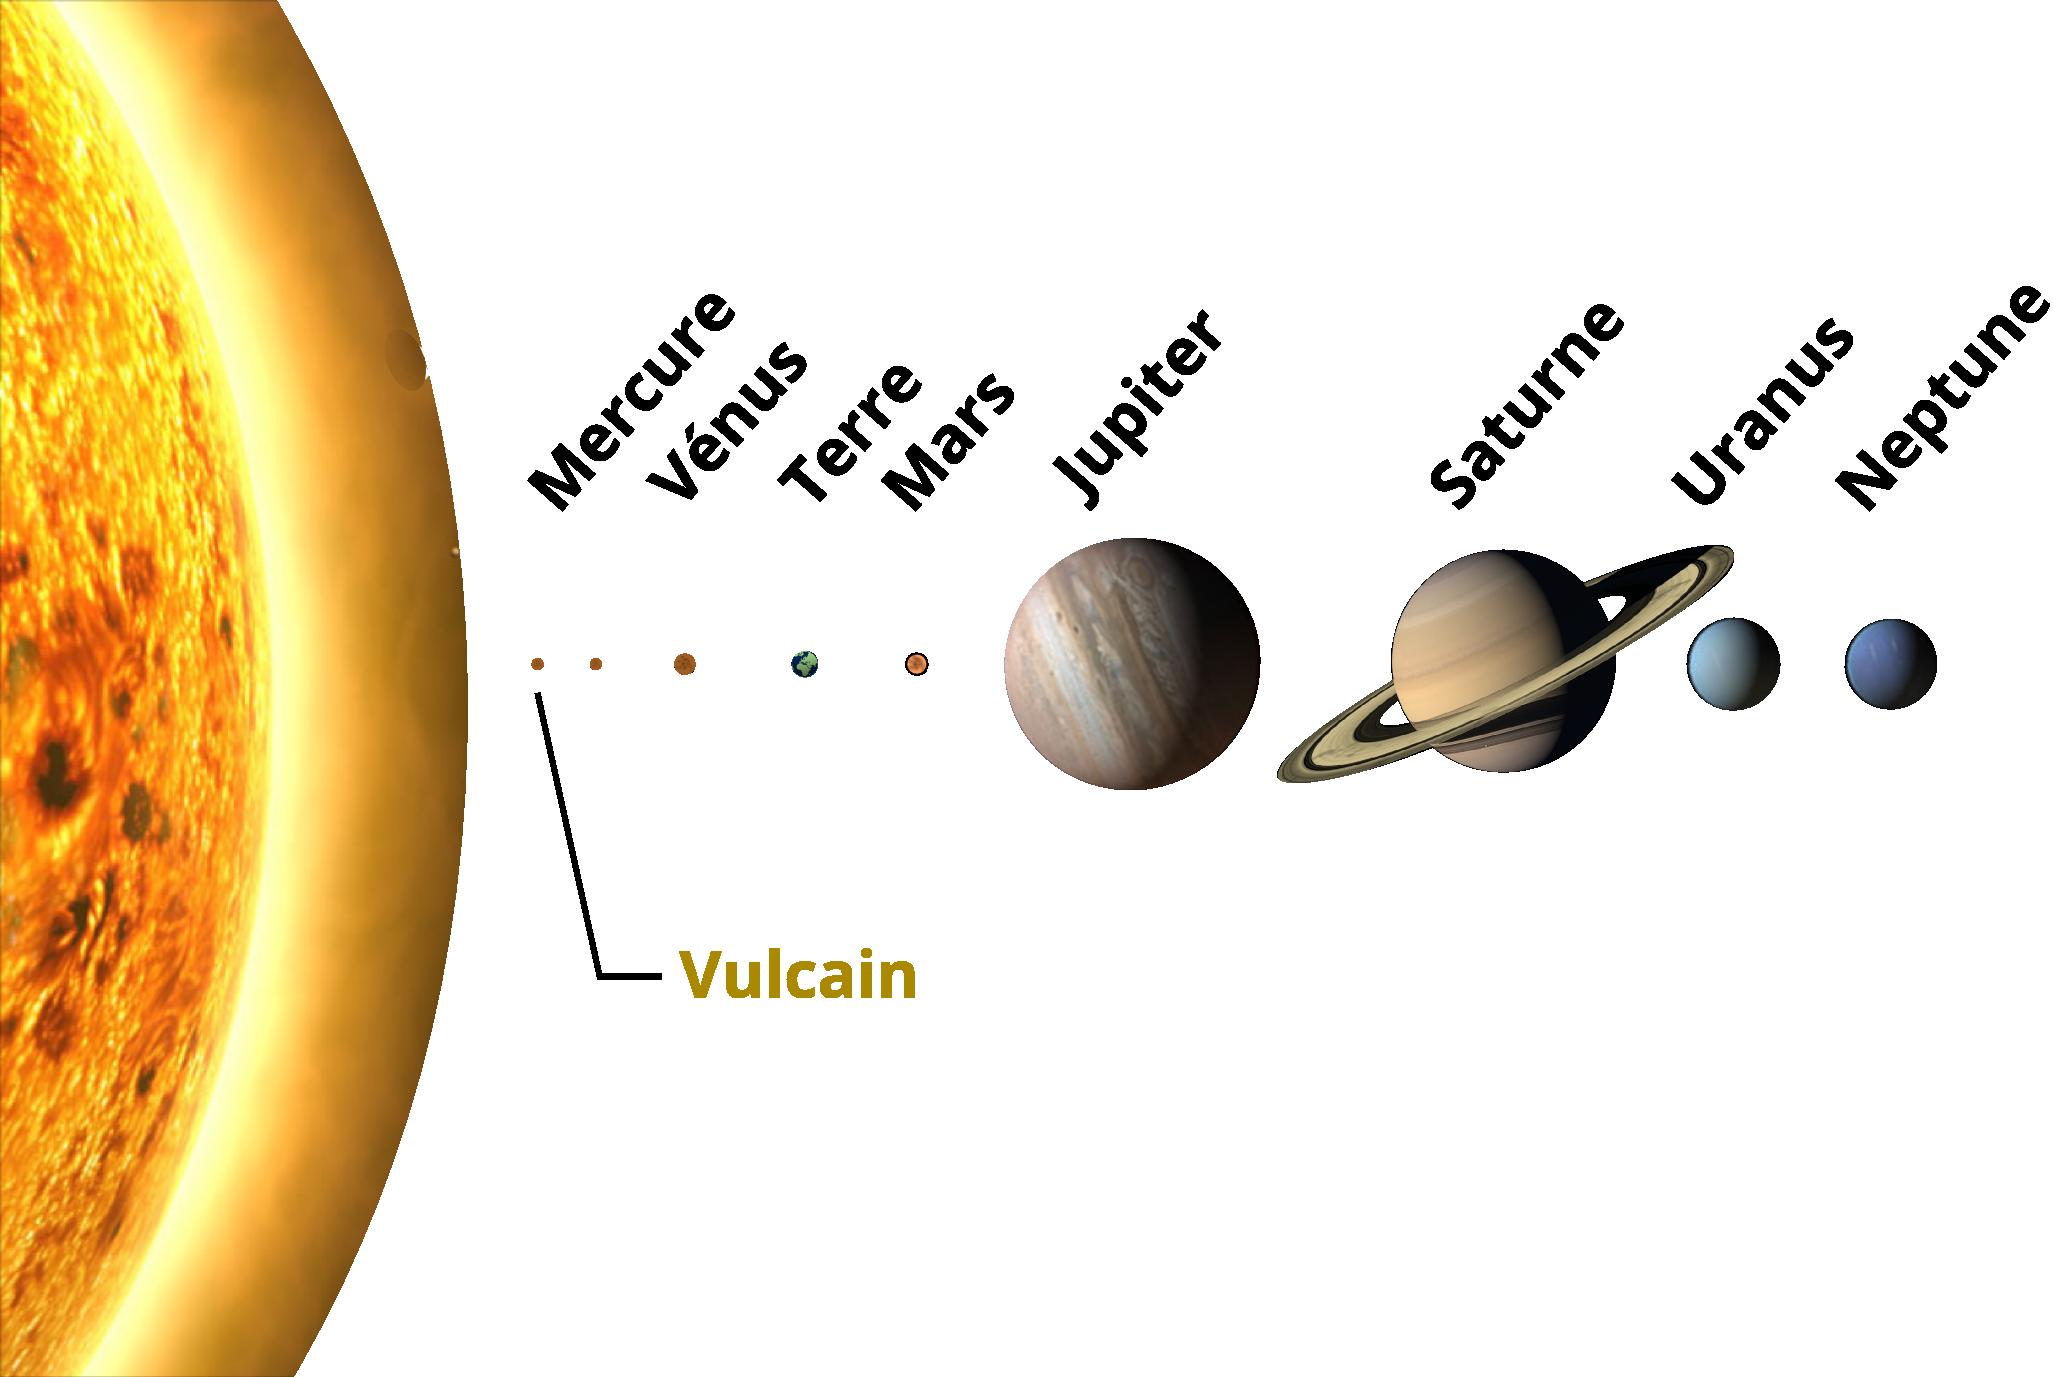 Vulcain_Systeme_solaire